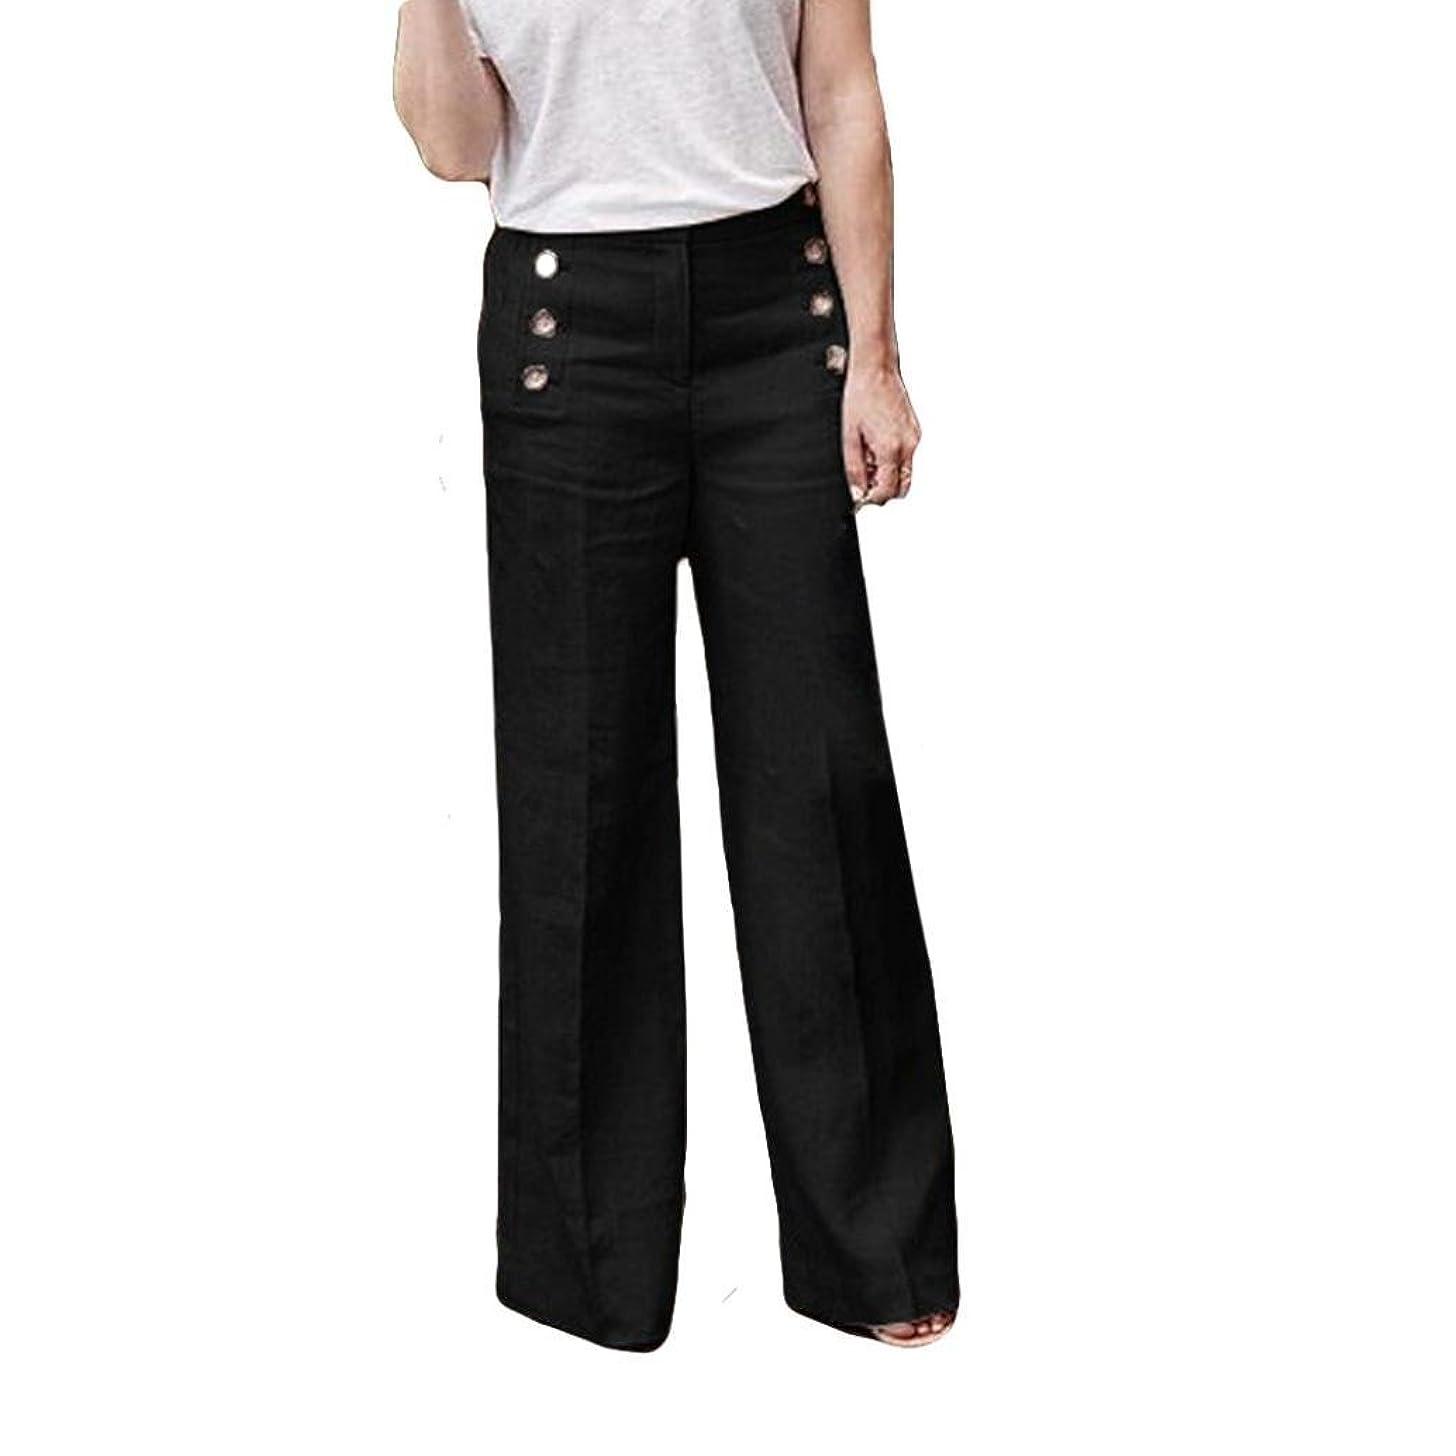 Pervobs Women Pants, Women Fashion Pants Casual Loose Elastic Button Zipper Fly High Waist Wide Leg Pants